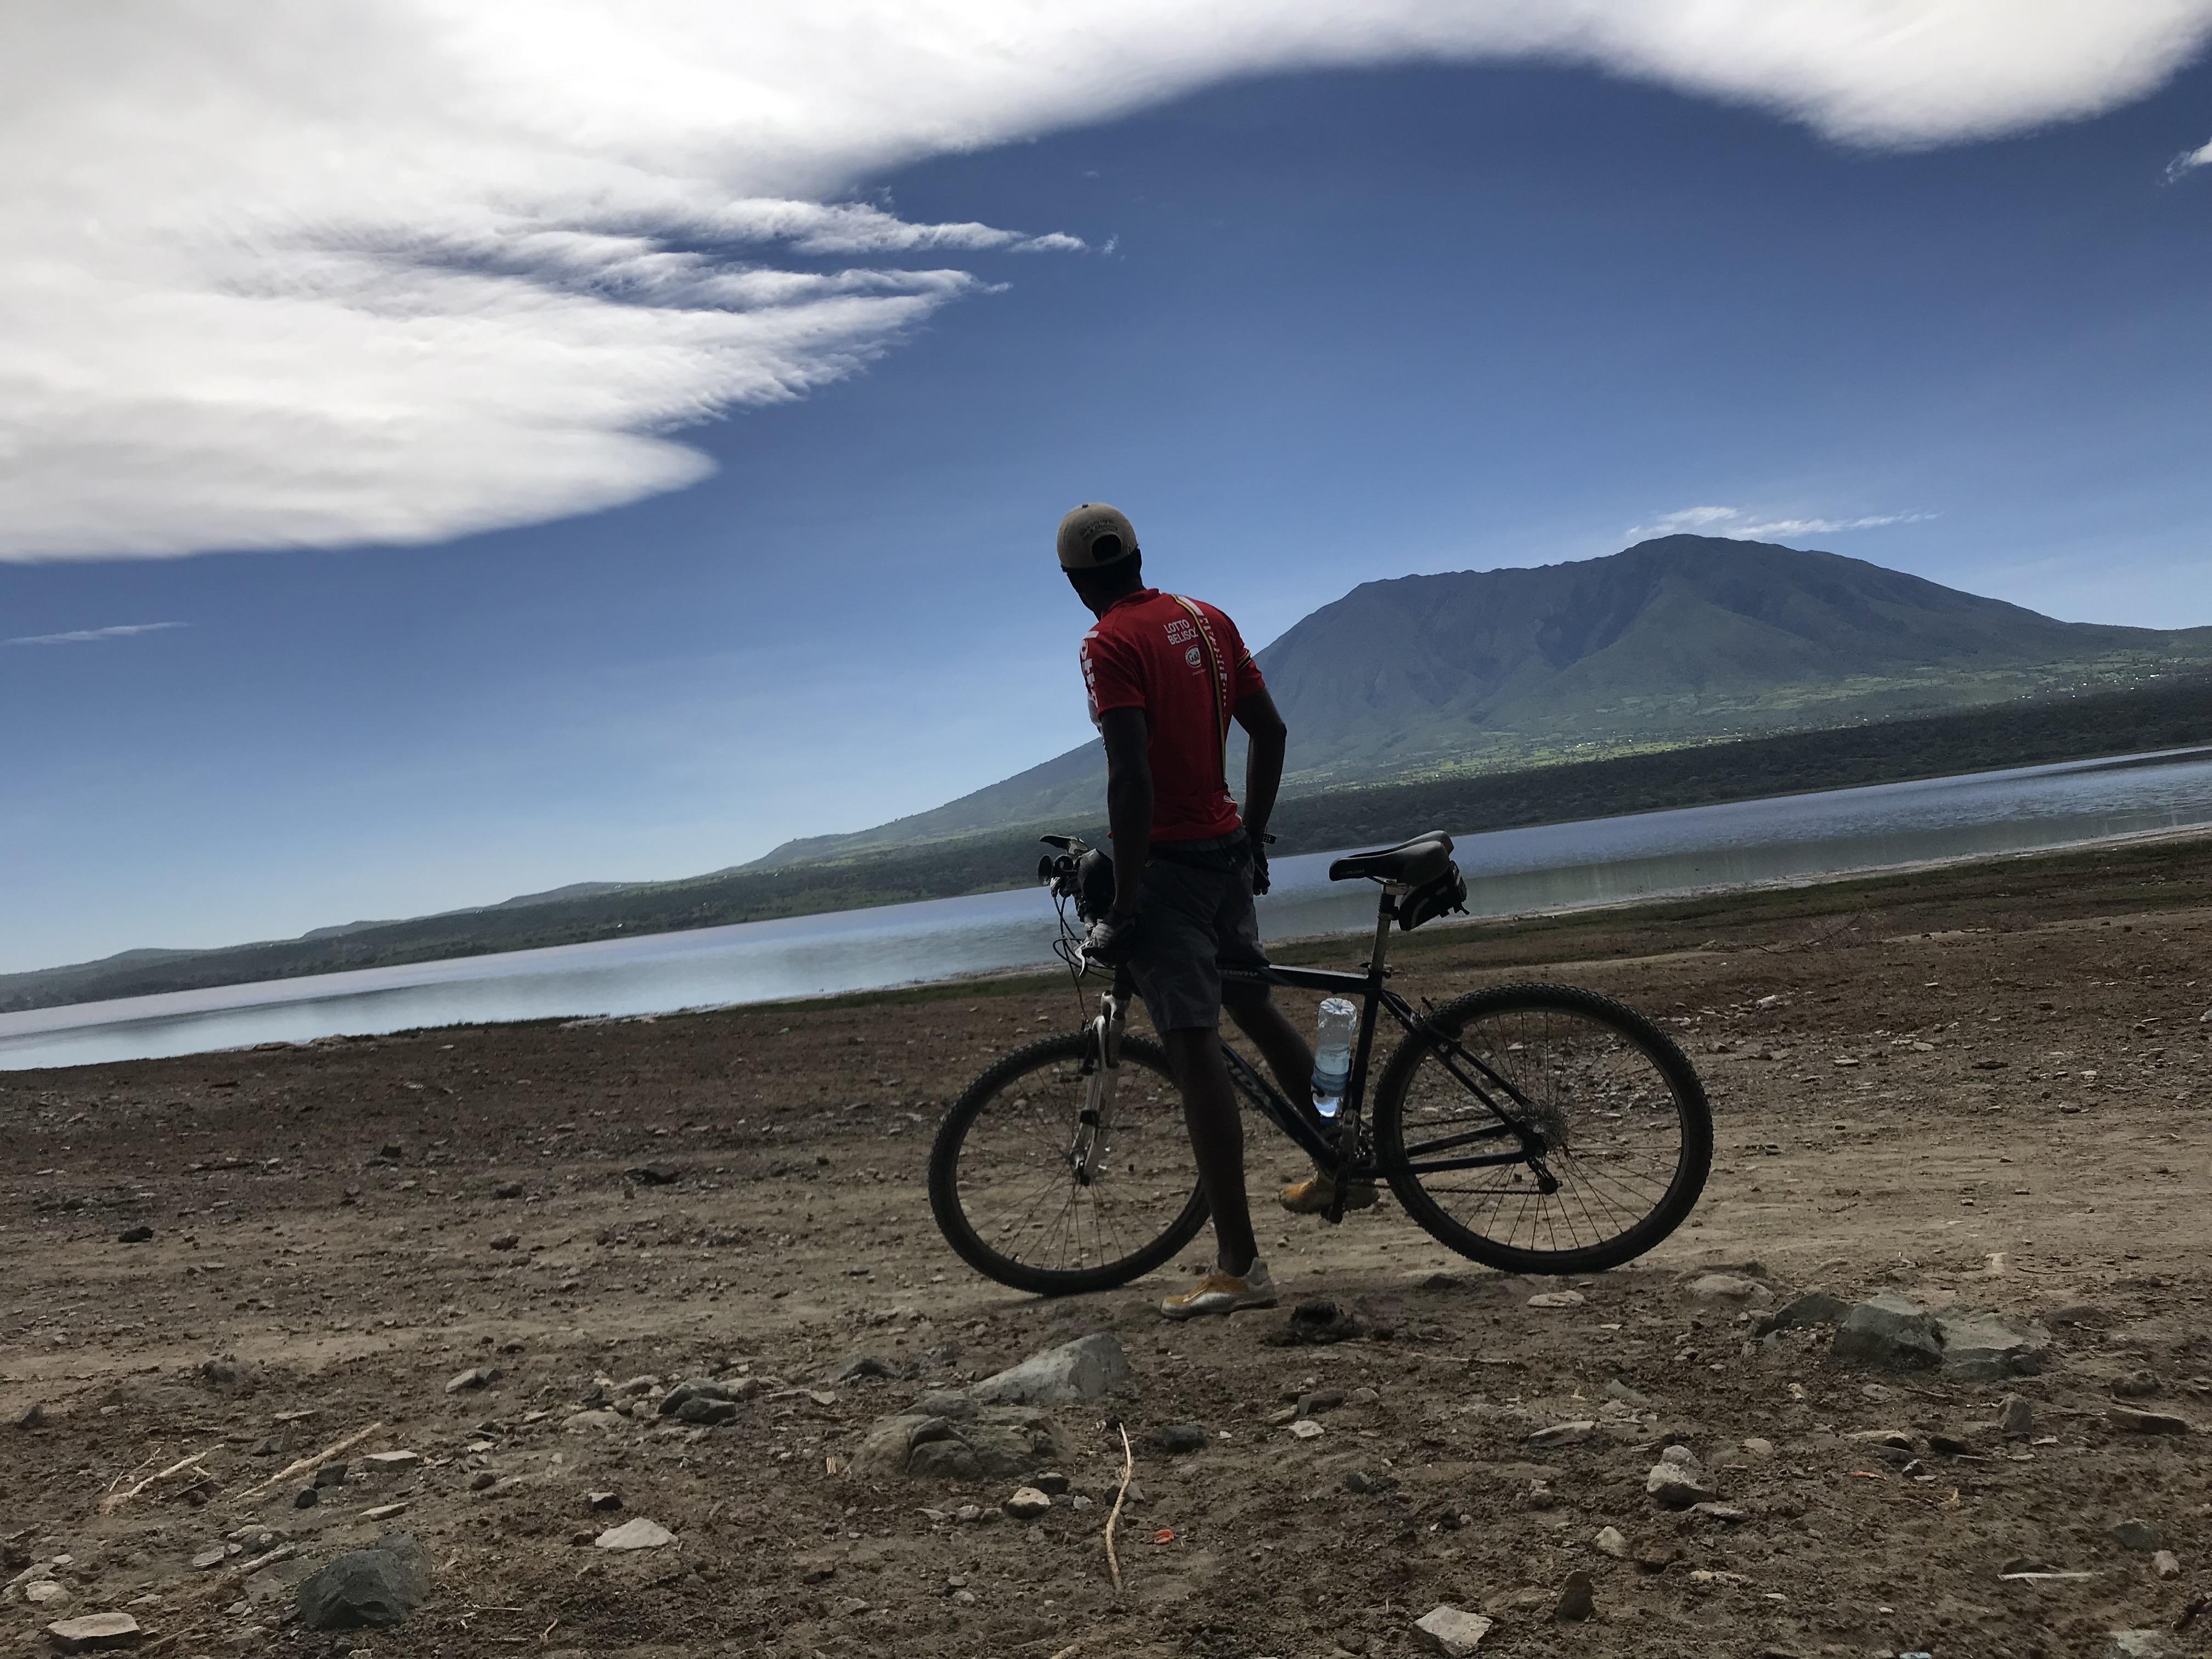 Tanzania Bicycle Tour-Tanzania Mountain Bike-El Mundo Safaris